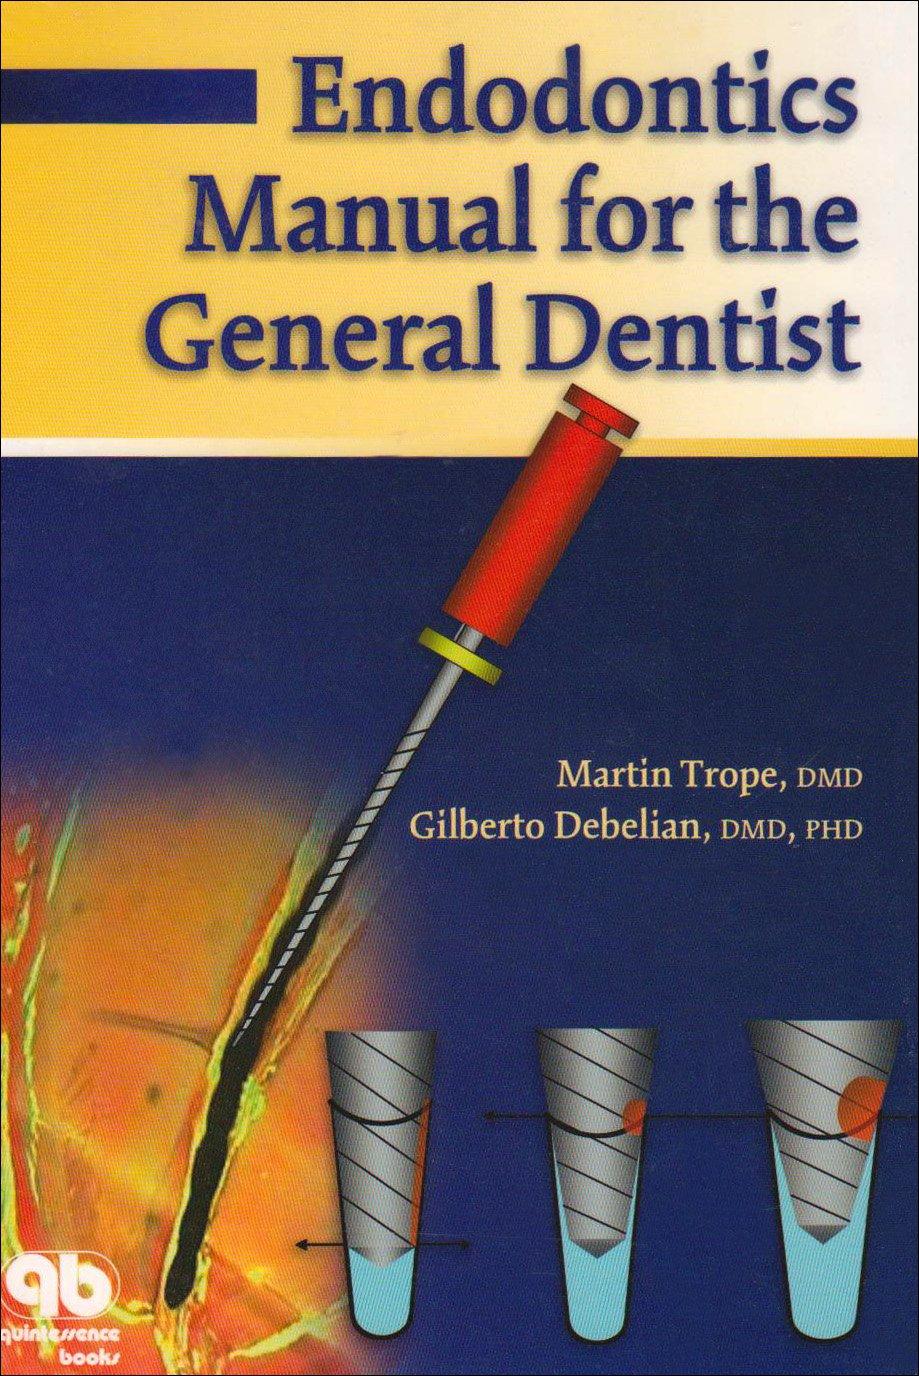 Endodontics Manual for the General Dentist: Amazon.co.uk: Martin Trope,  Gilberto Debelian: 9781850970897: Books